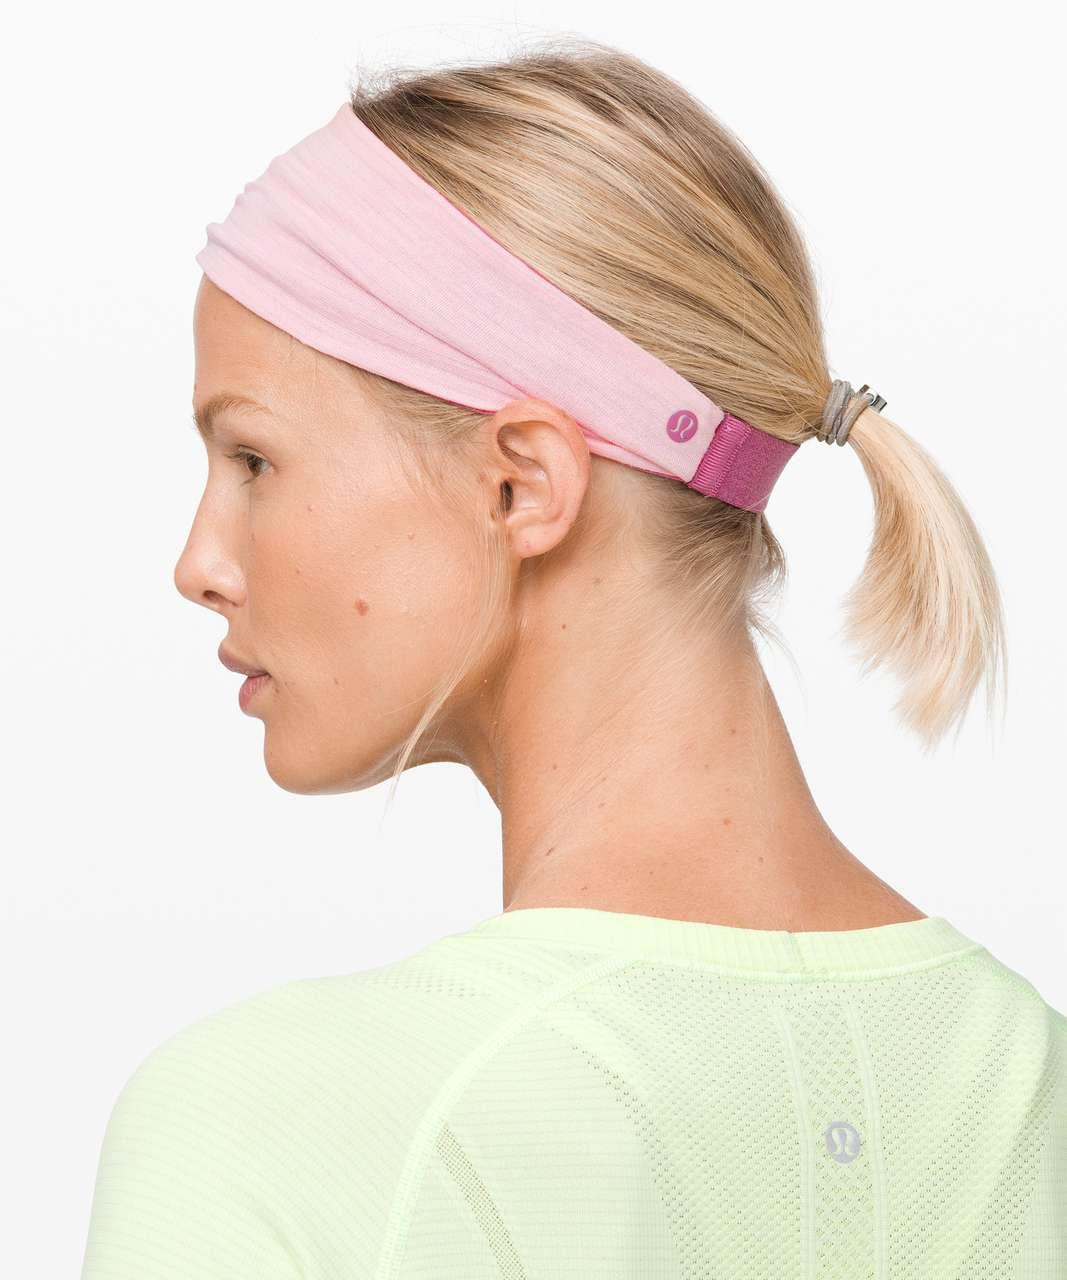 Lululemon Fringe Fighter Headband - Moss Rose / Heathered Dusty Pink